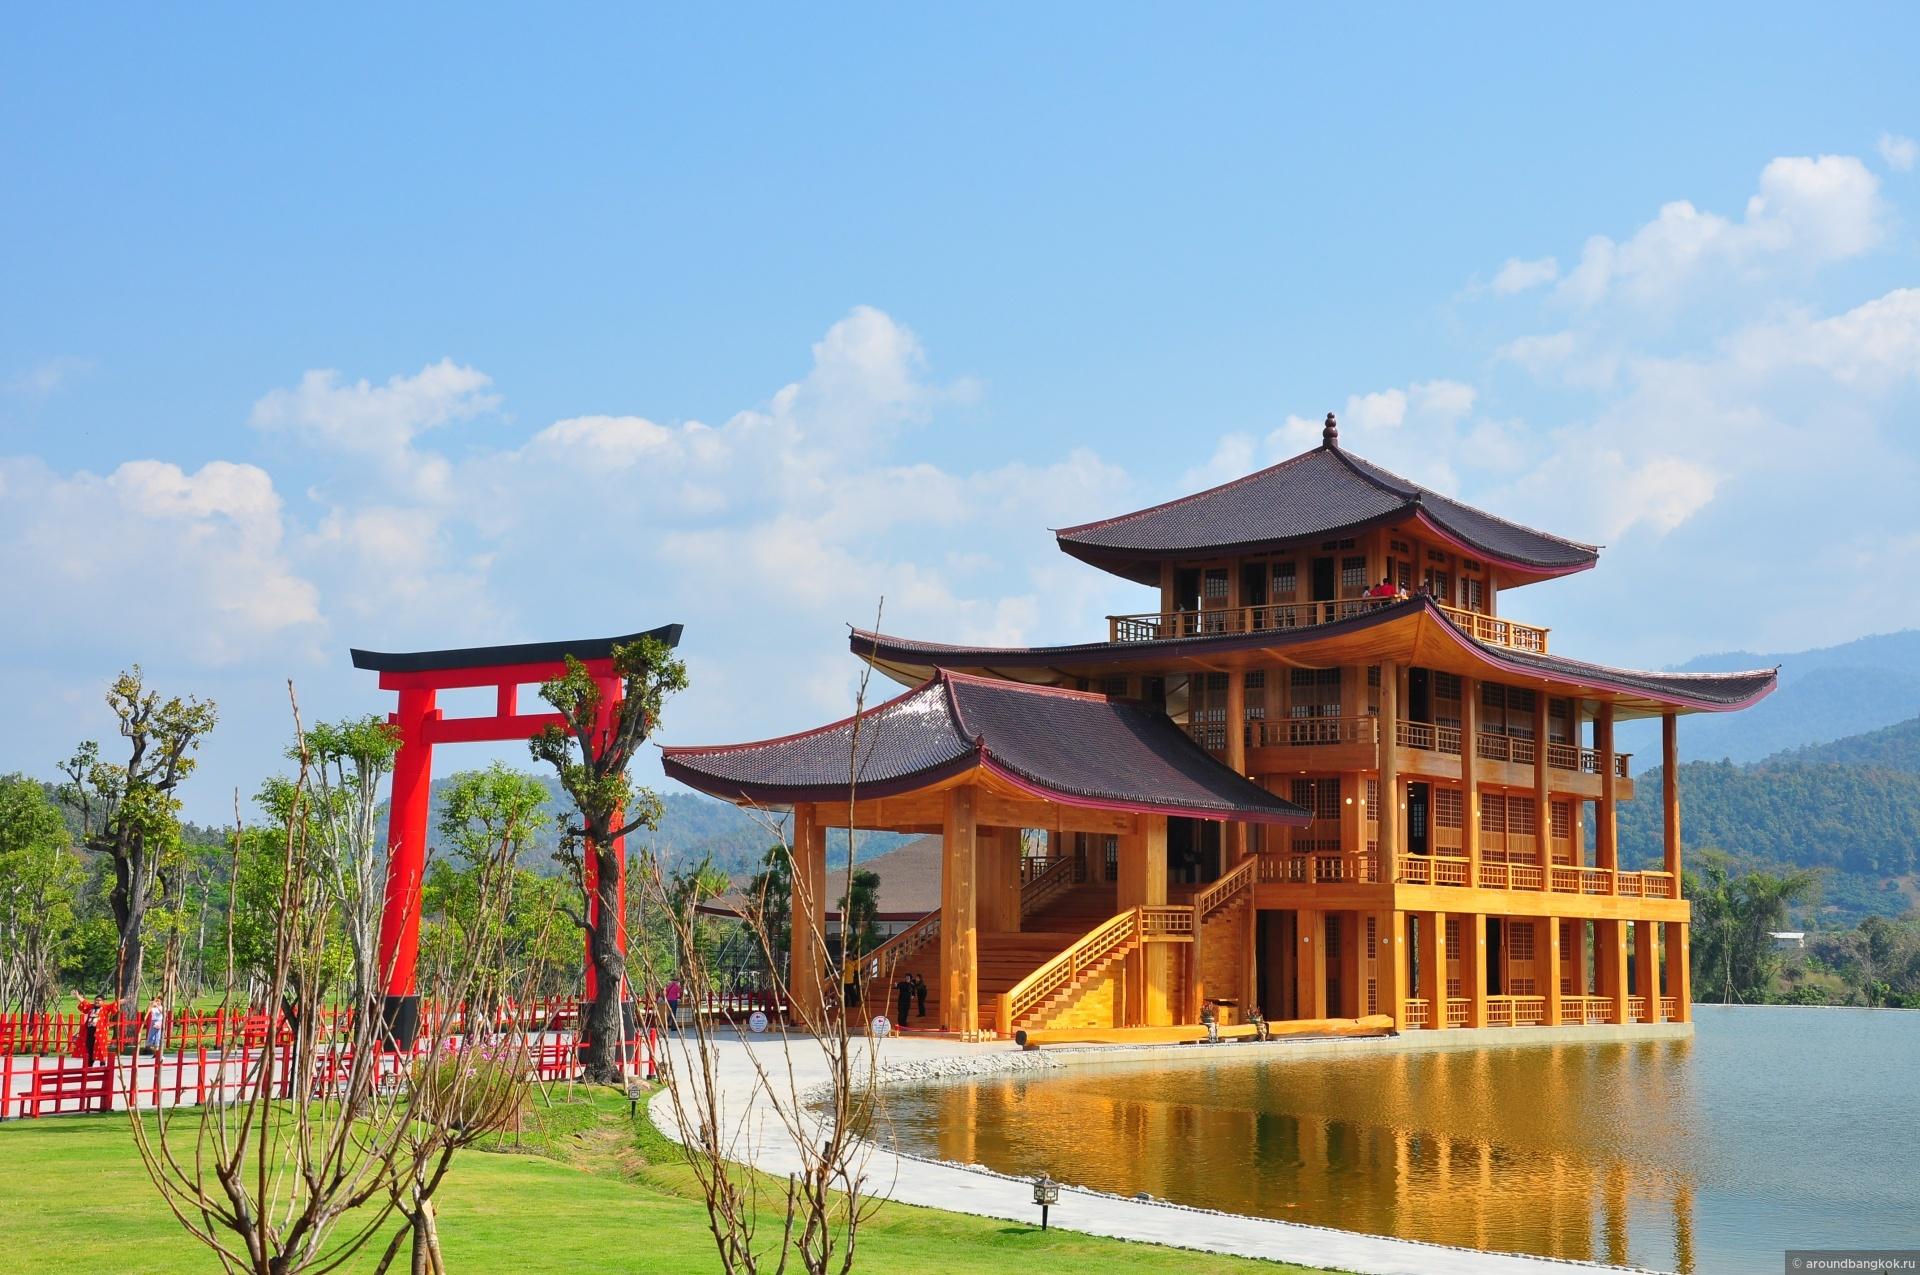 Японский городок на севере Таиланда